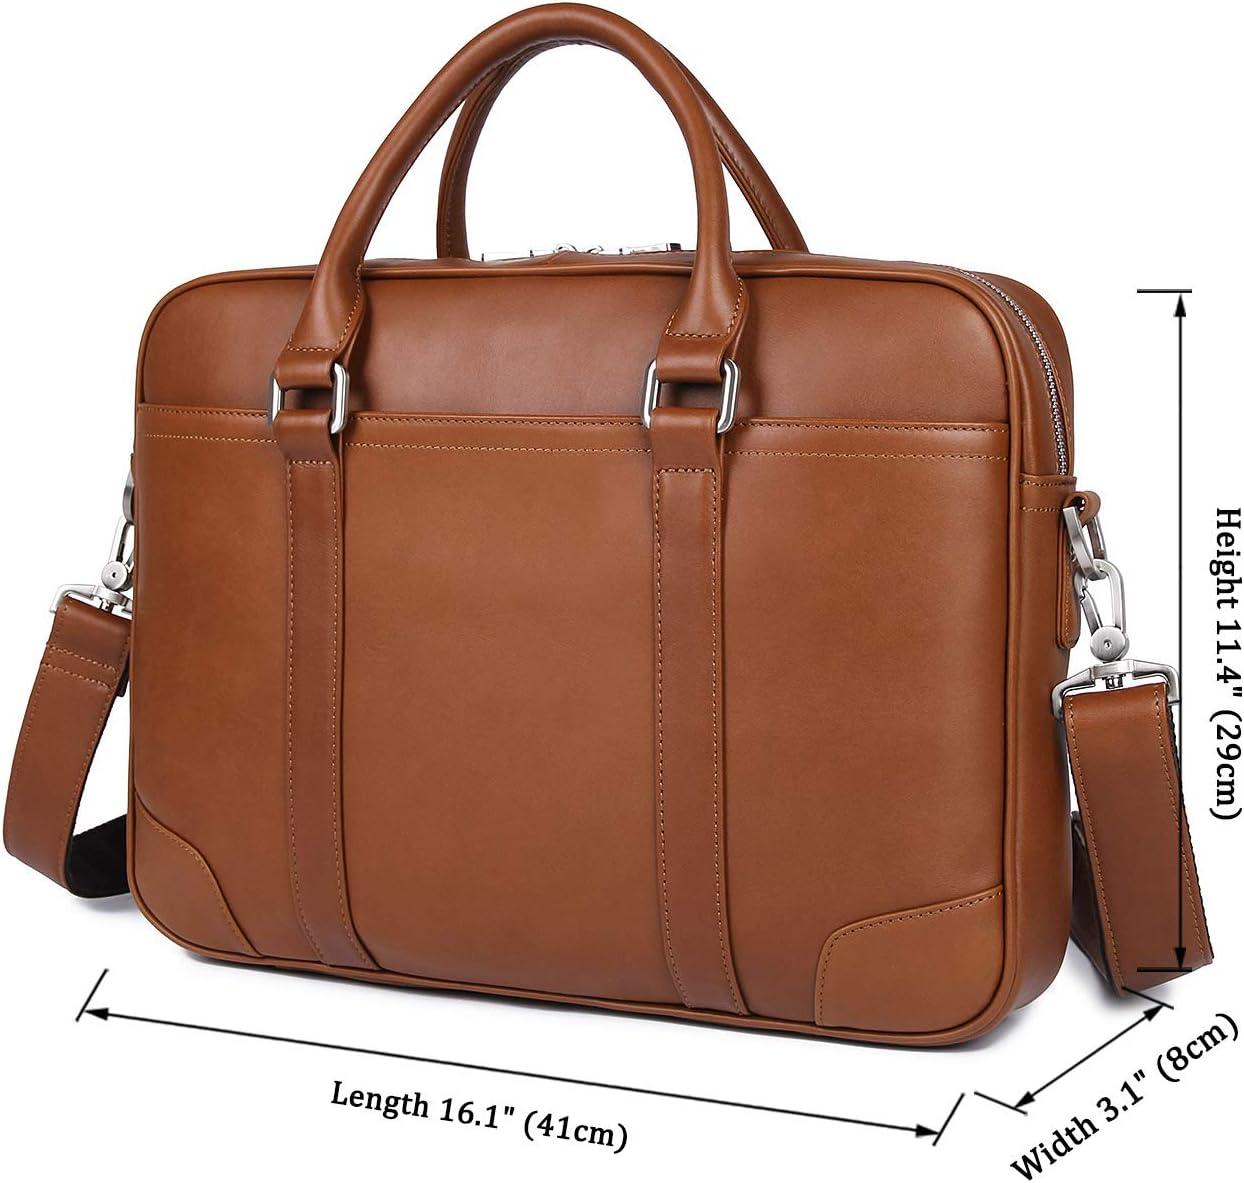 JuaoHuan Yu Yu Hakusho Laptop Shoulder Messenger Bag Case Briefcase Sleeve for 13 Inch 14 Inch 15.6 Inch Laptop Case 14 Inch